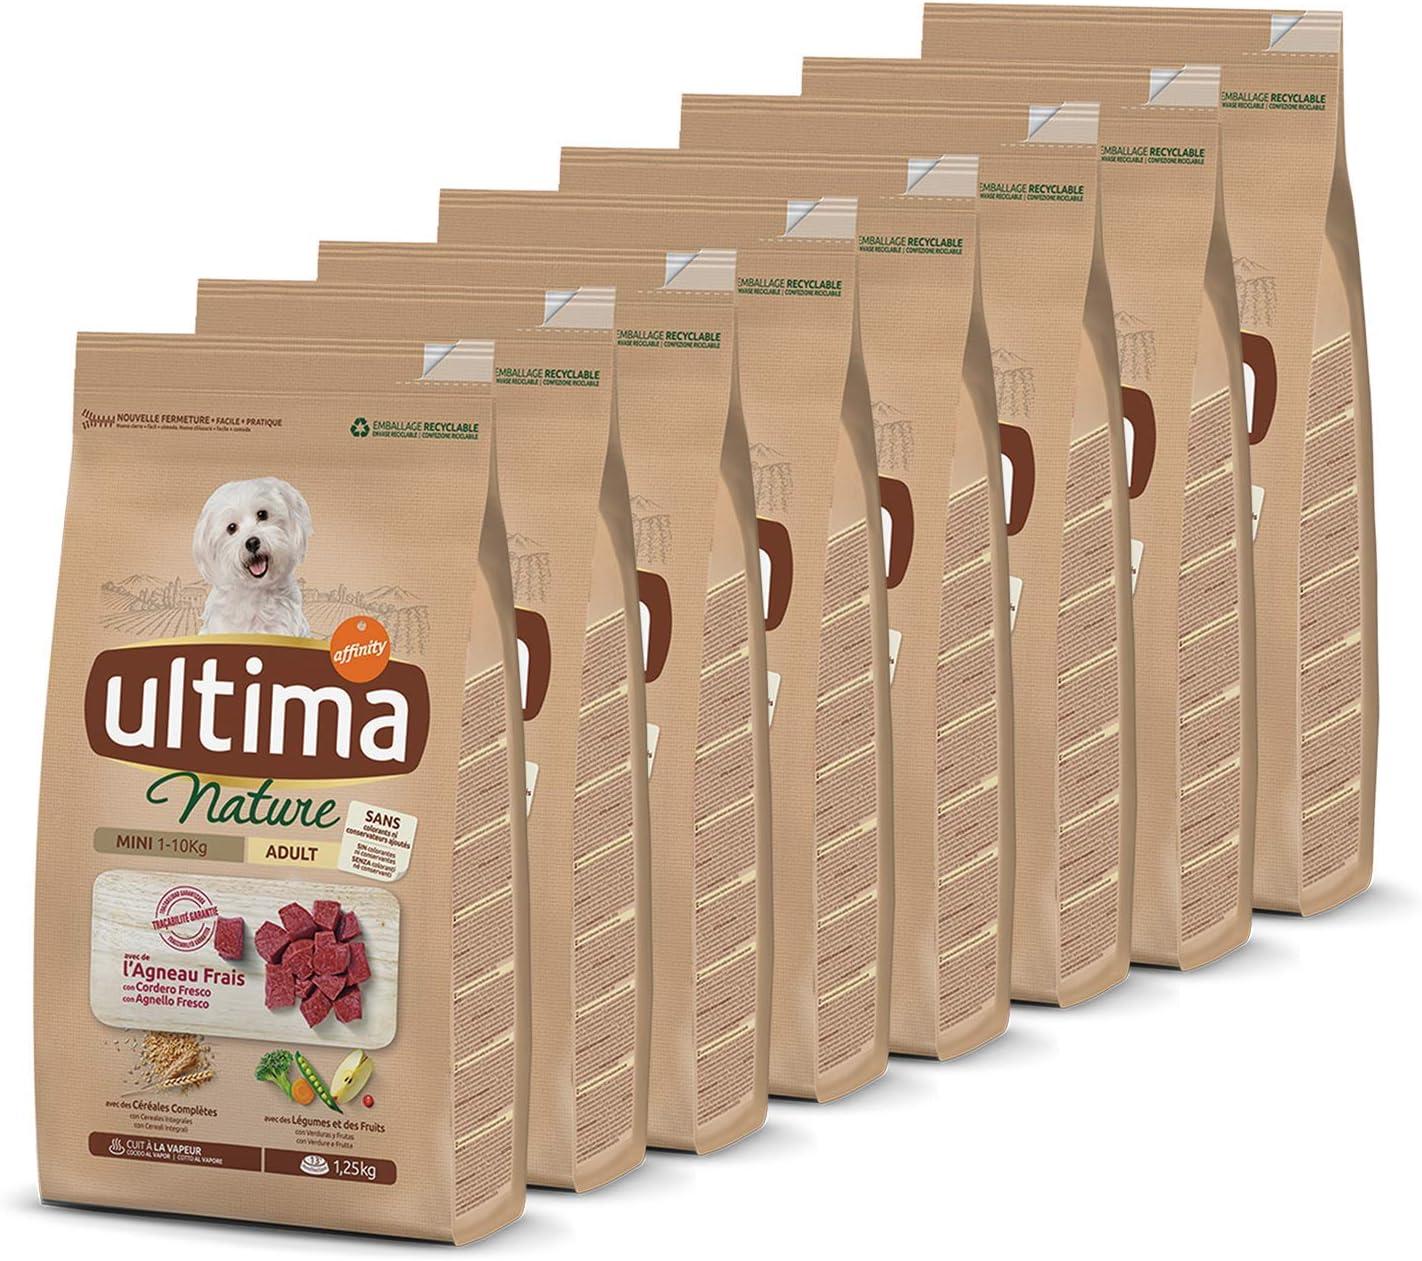 Ultima Nature No Grain Pienso para Perros Mini sin Cereales con Pavo, Pack de 8 x 1.1kg - Total: 8.8Kg